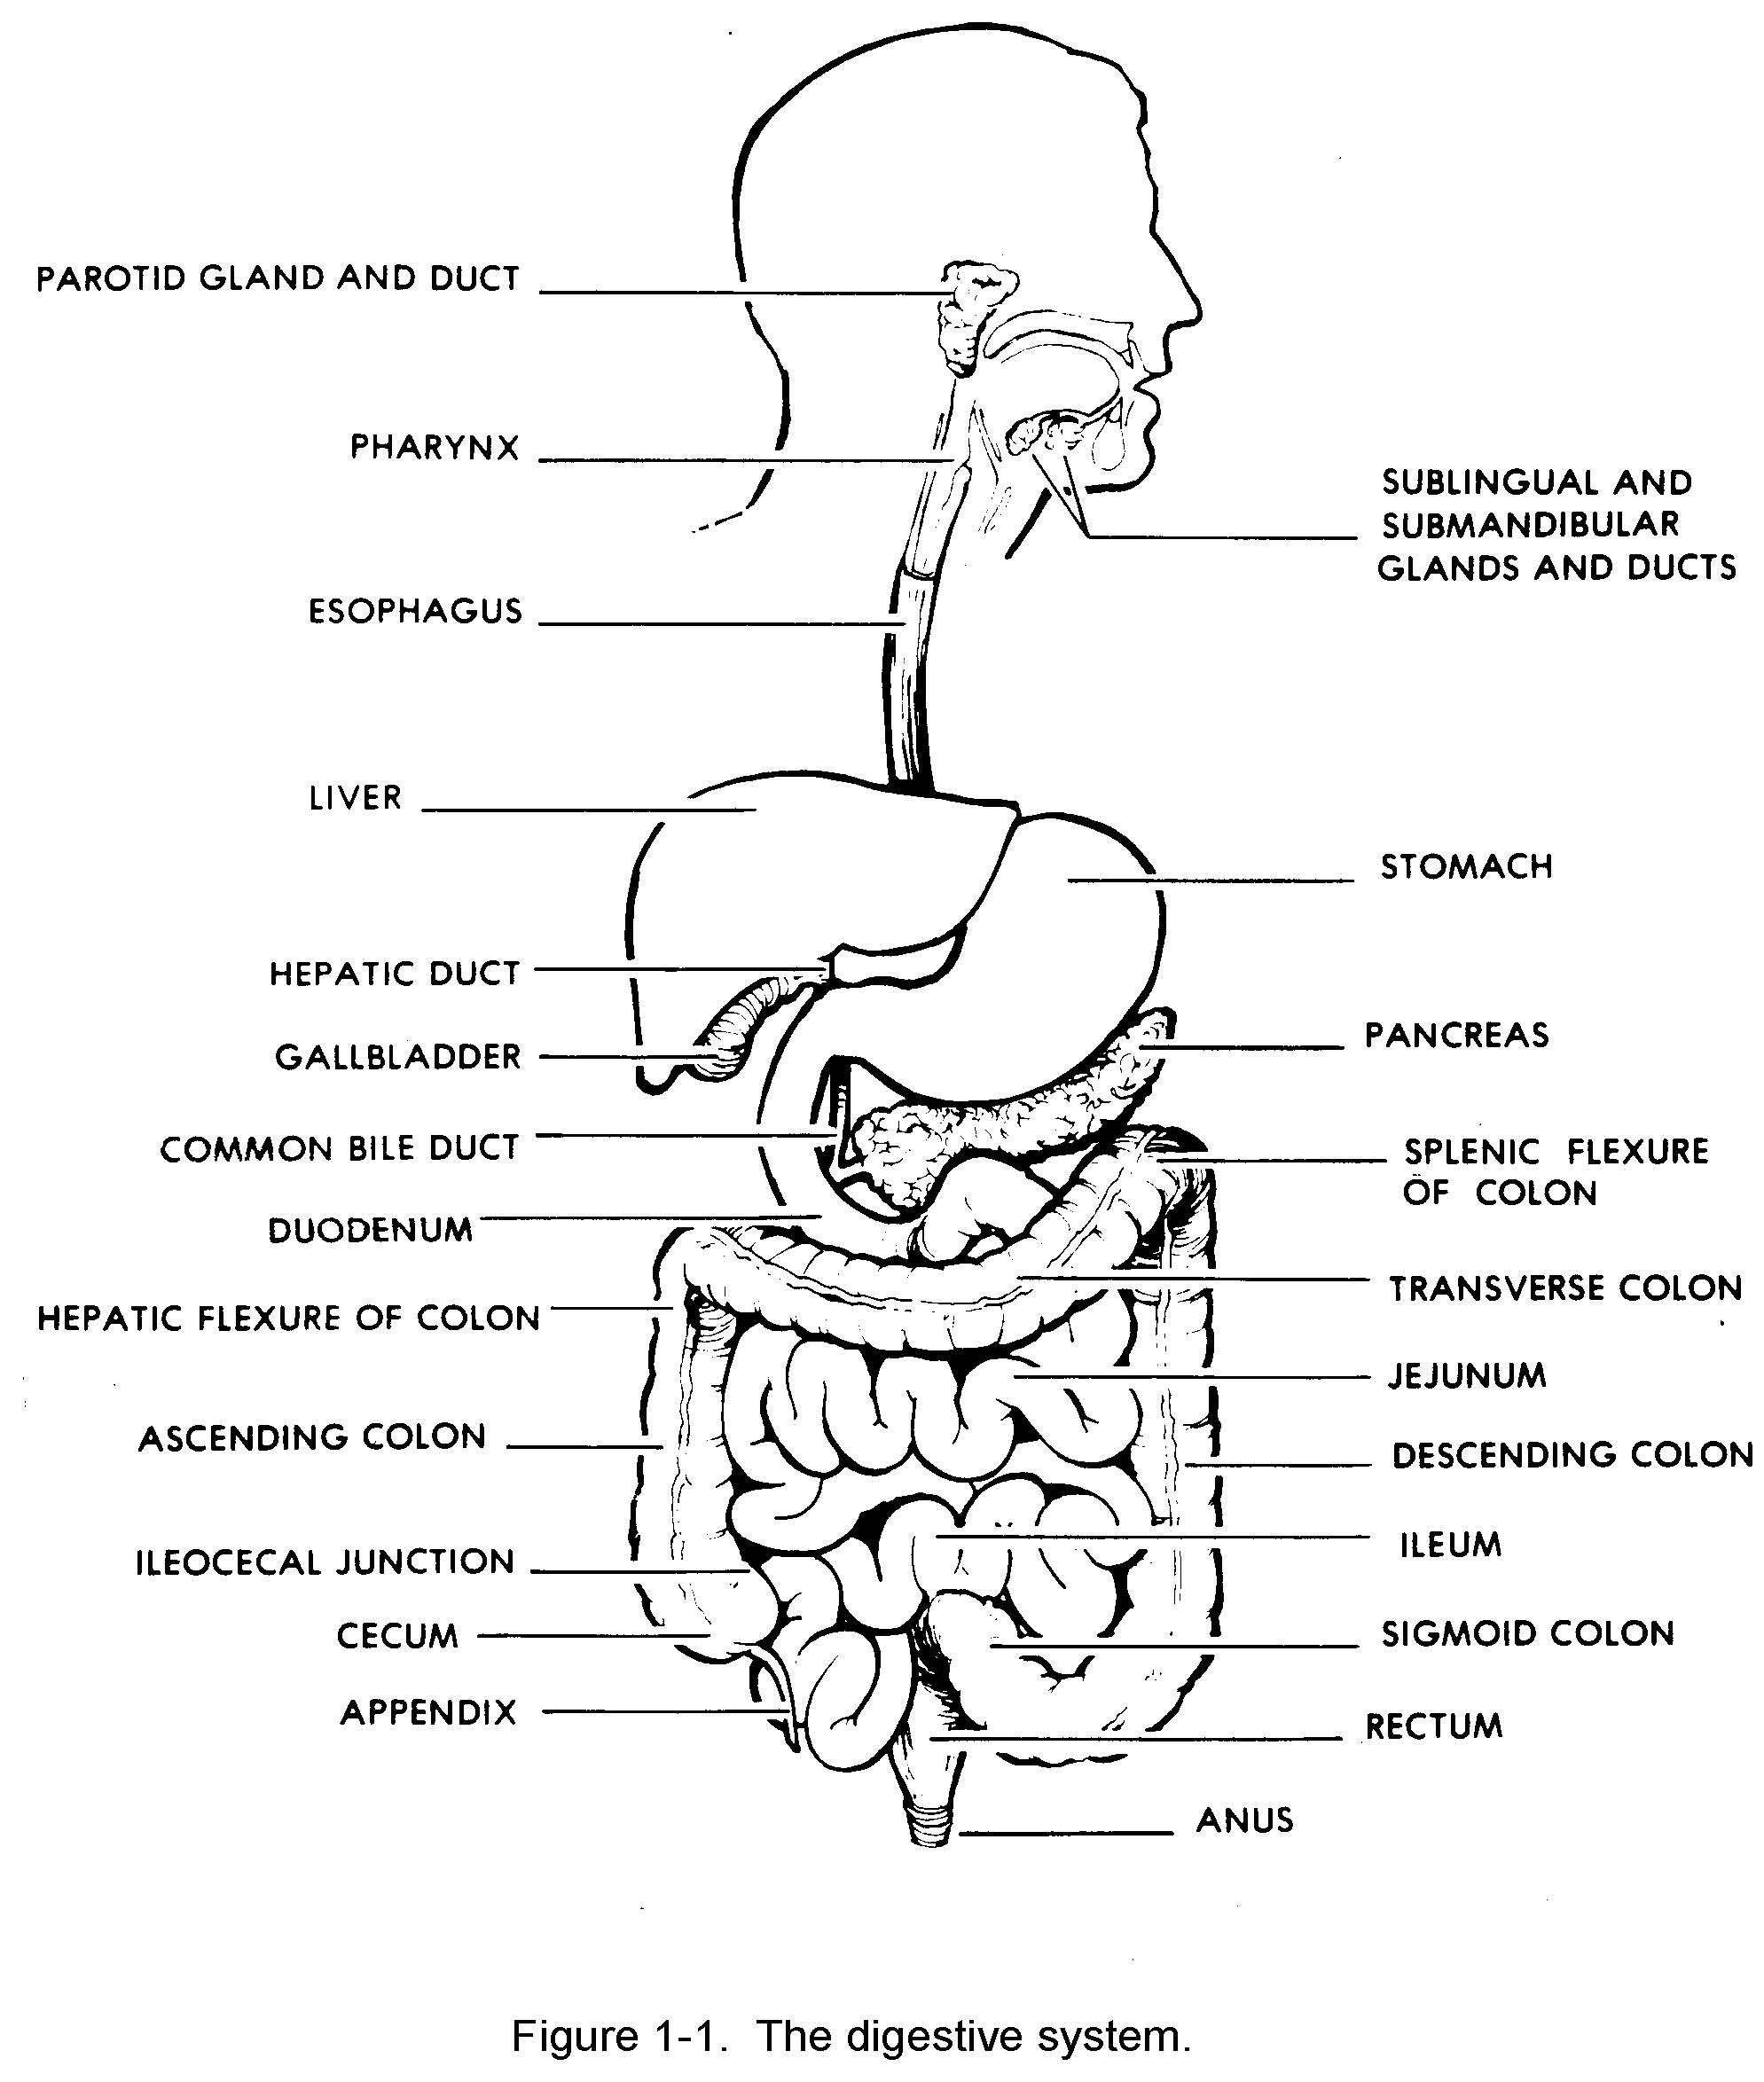 Digestive System Labelling Worksheet Stomach Labeling Worksheet Blank In 2020 Human Digestive System Digestive System Diagram Digestive System